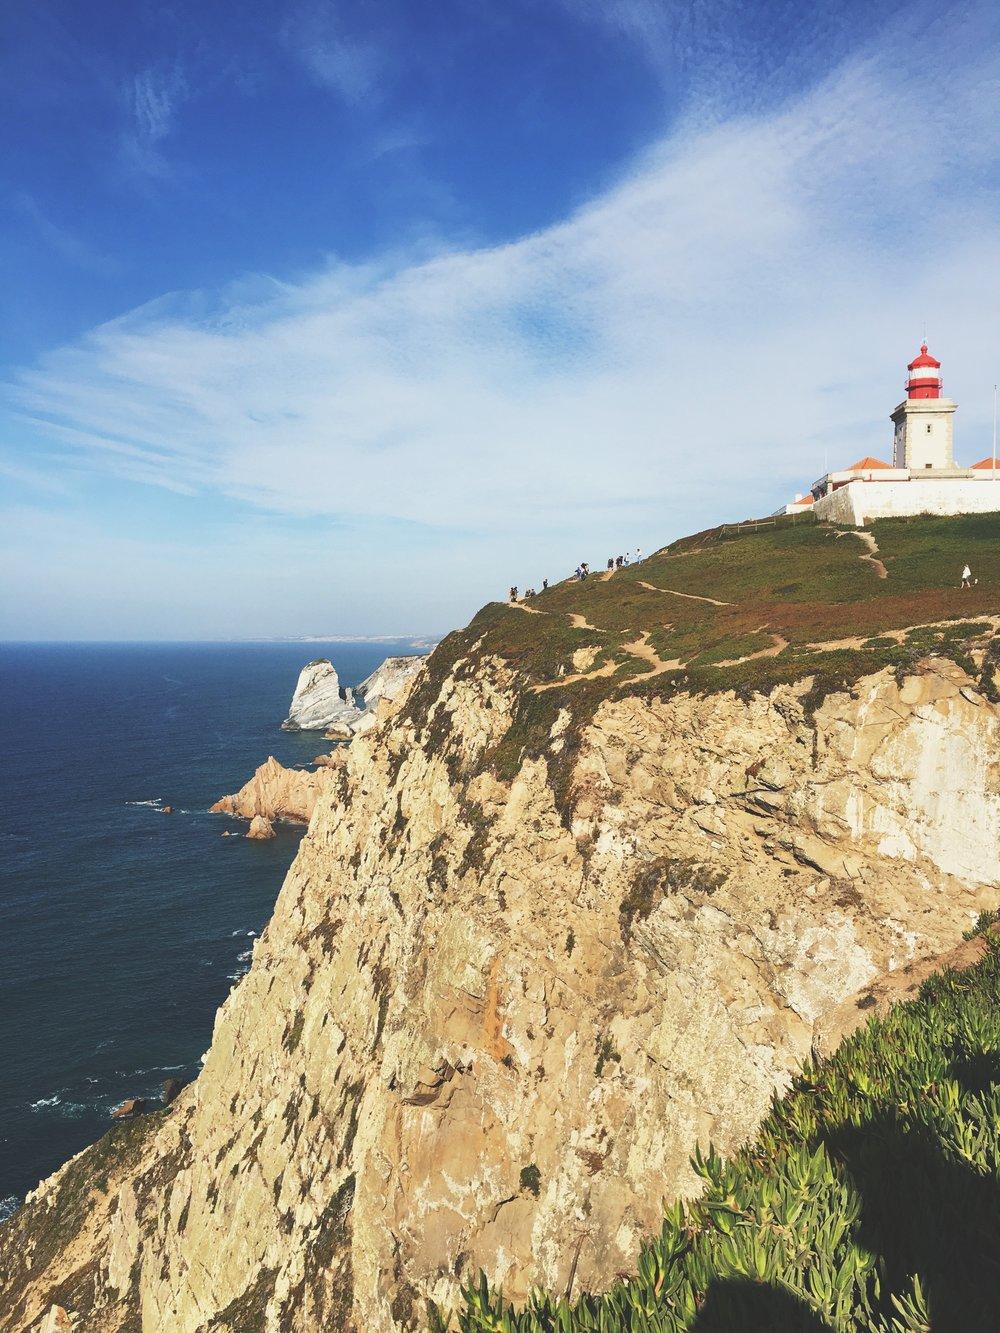 - Cabo da roca